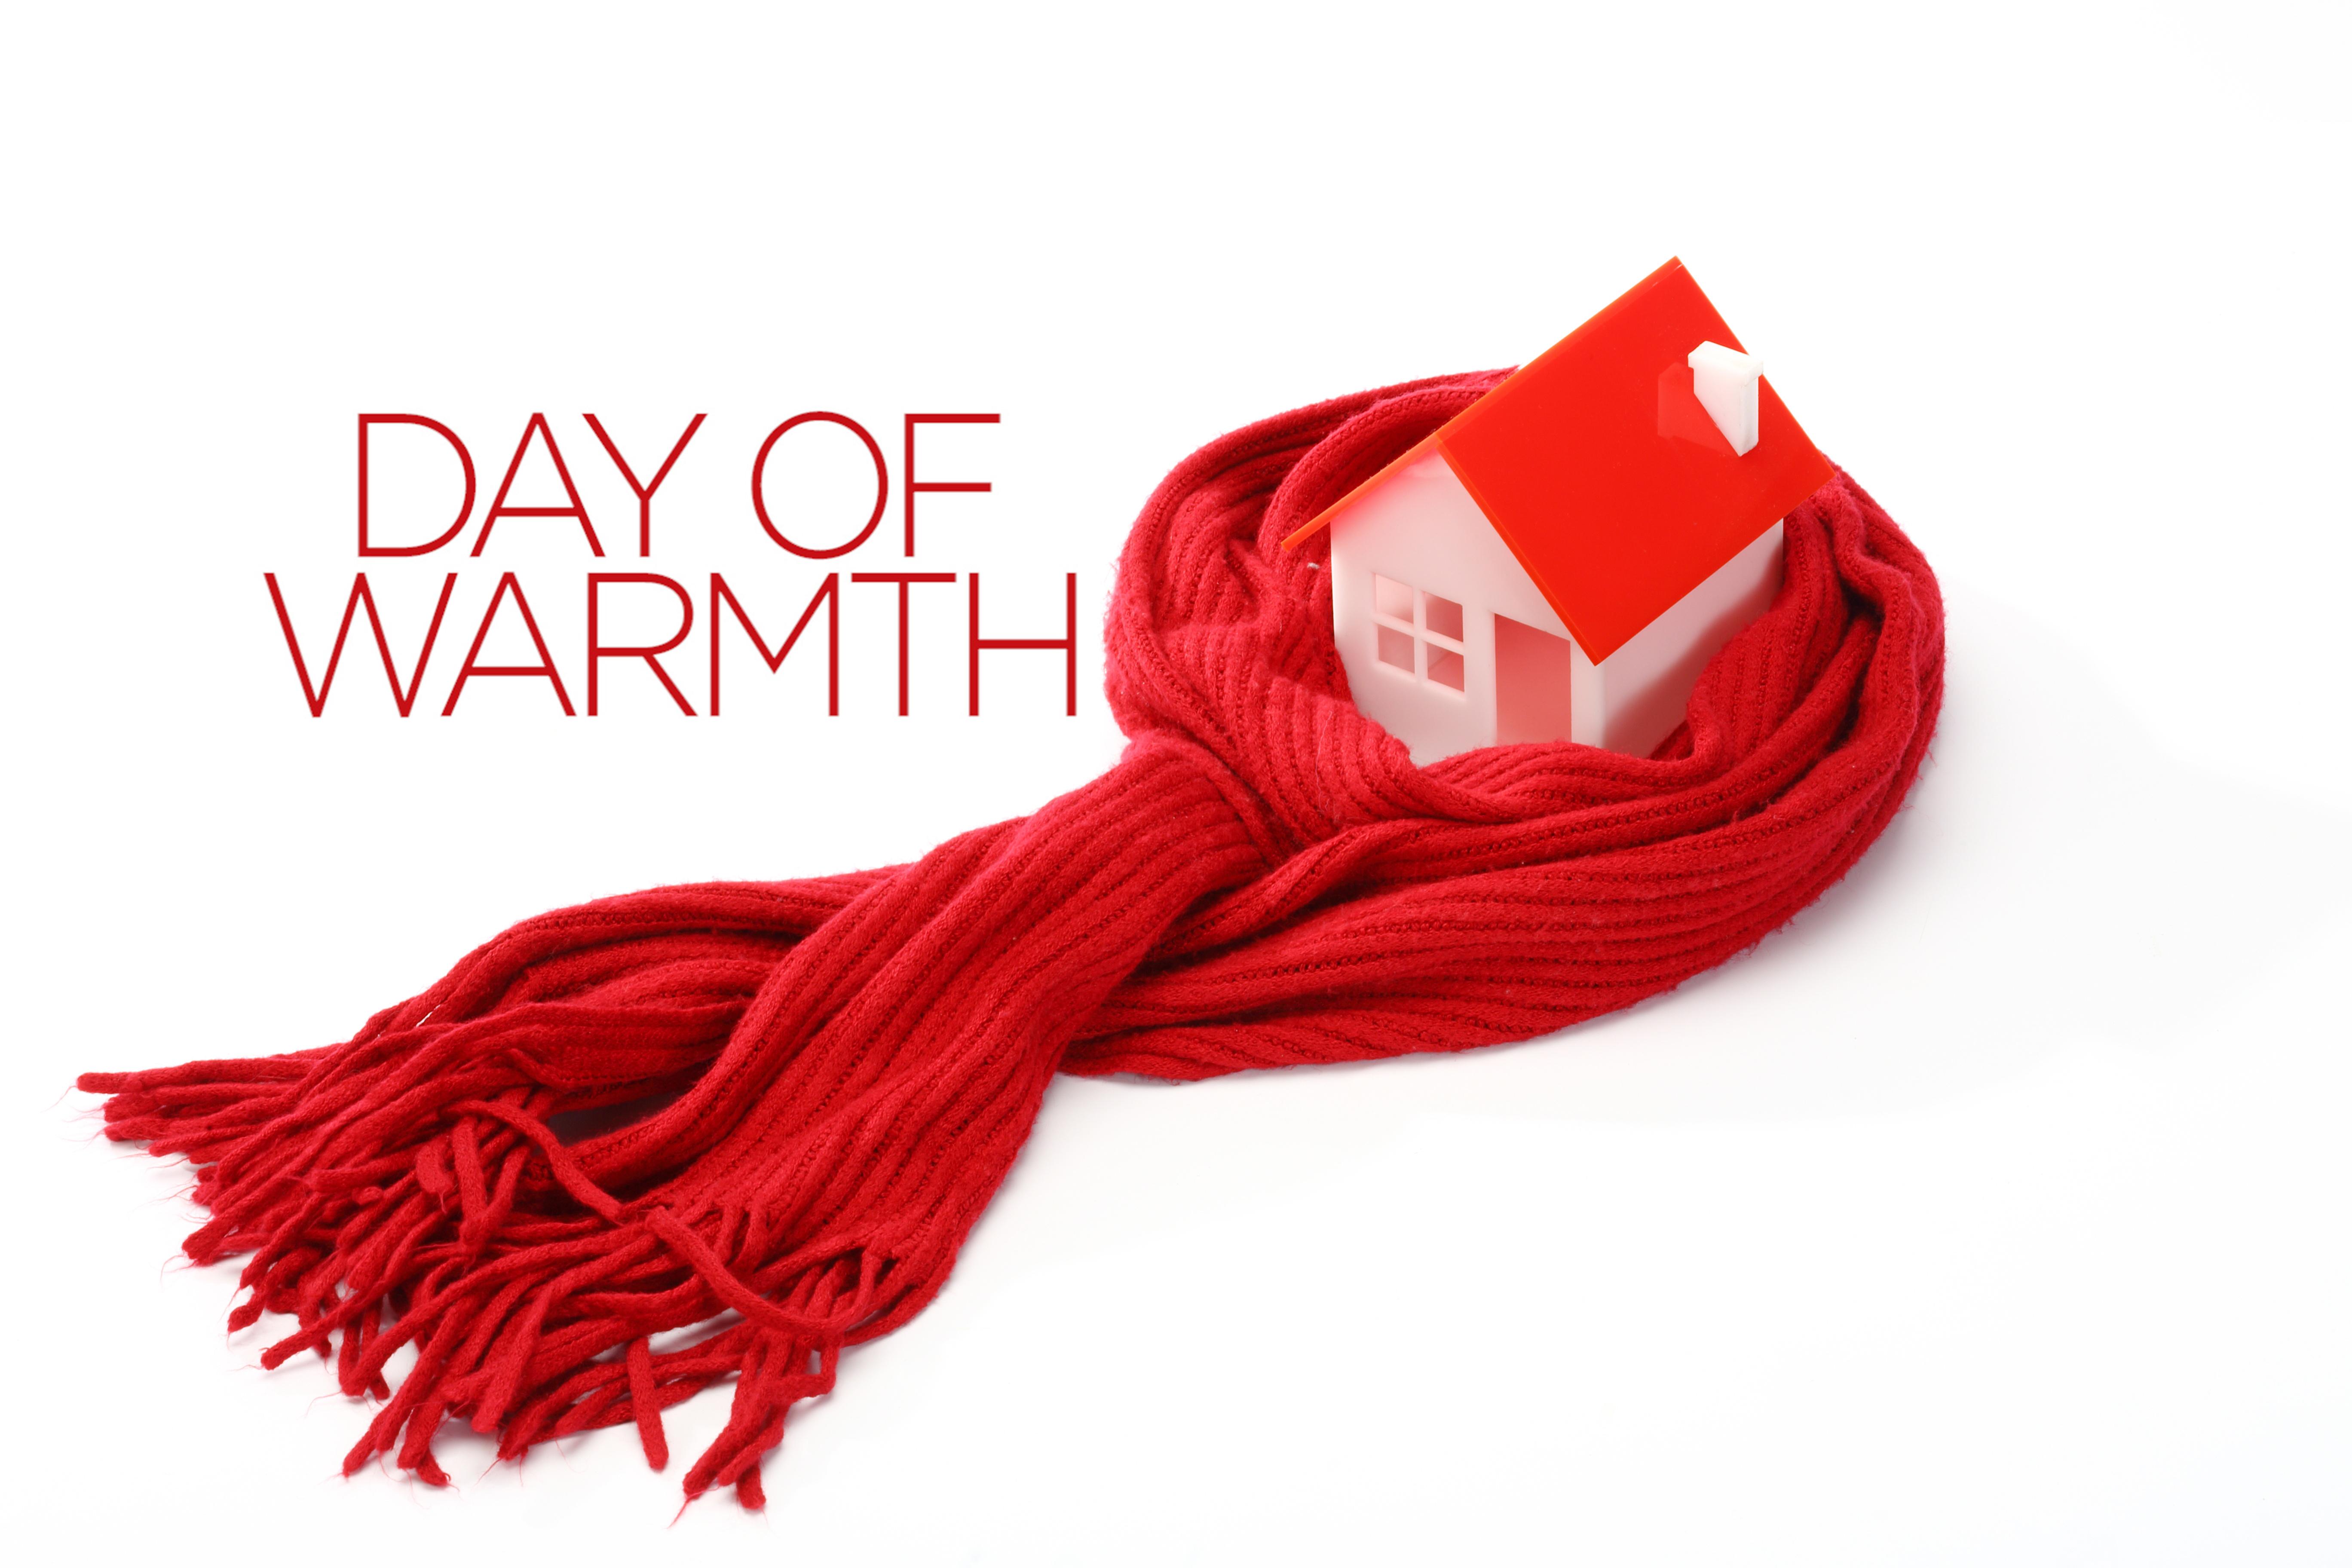 http://kwwf.org/sites/kwwf.org/assets/images/default/DAY-OF-WARMTH-FIX-1.jpg